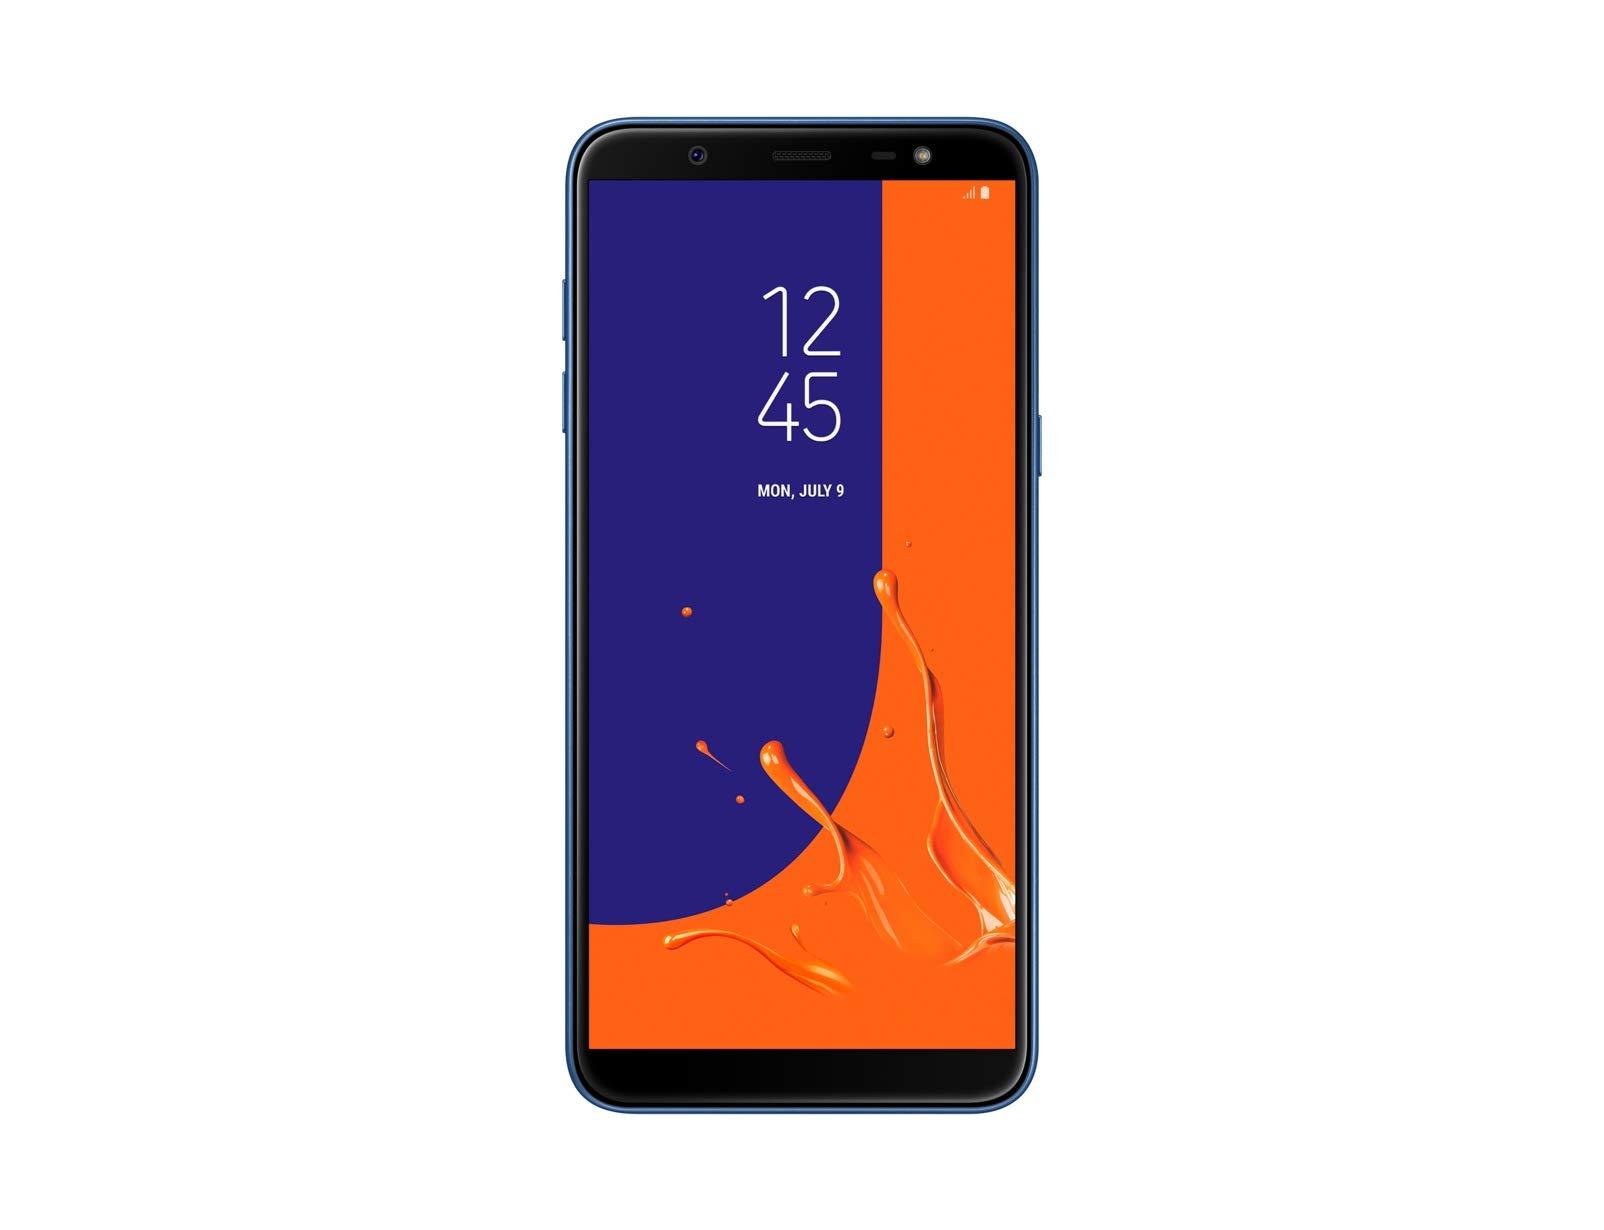 Samsung Galaxy J8 (2018) Duos SM-J810F/DS 32GB Dual SIM Factory Unlocked GSM Smartphone - International Version, No Warranty (Blue)